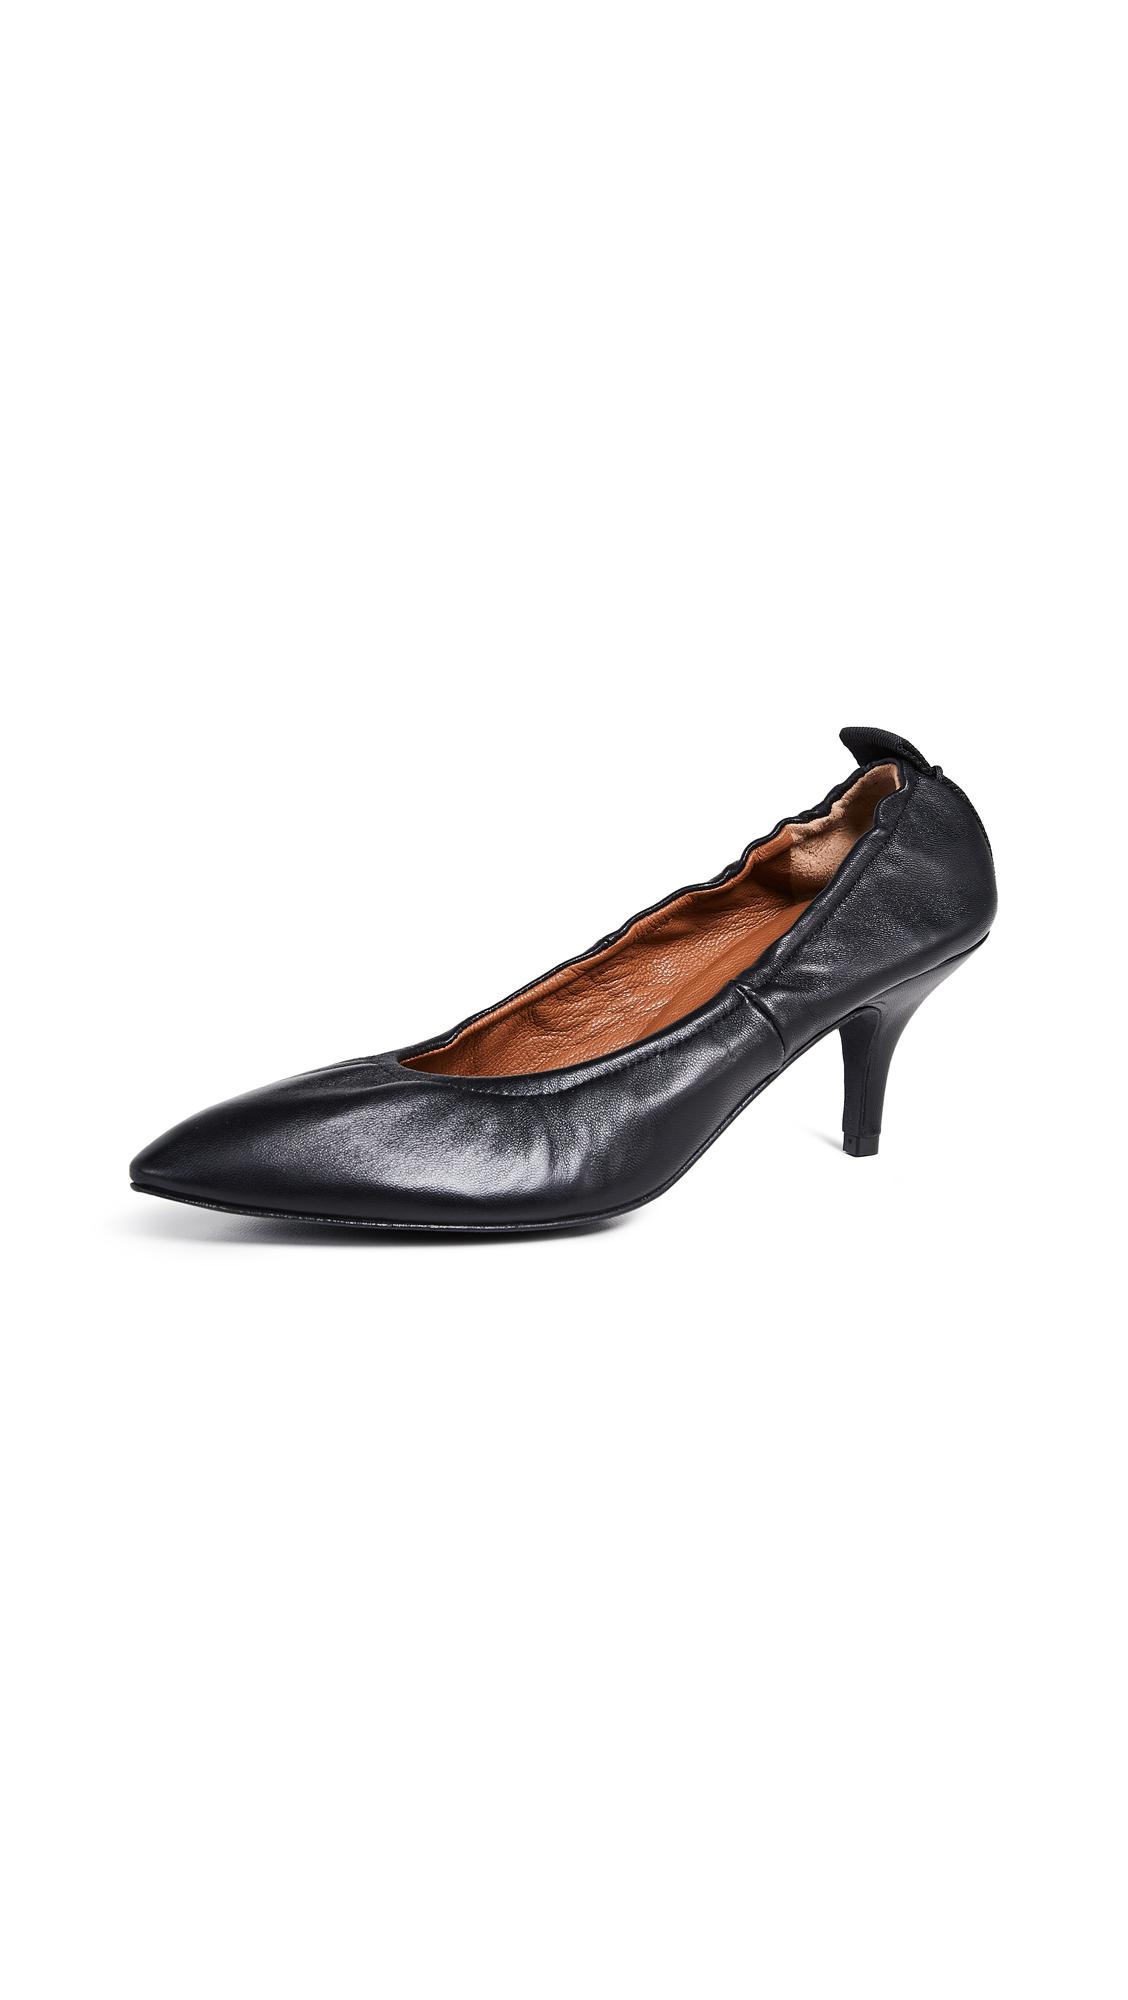 Joseph Dallin Kitten Heel Pumps - Black